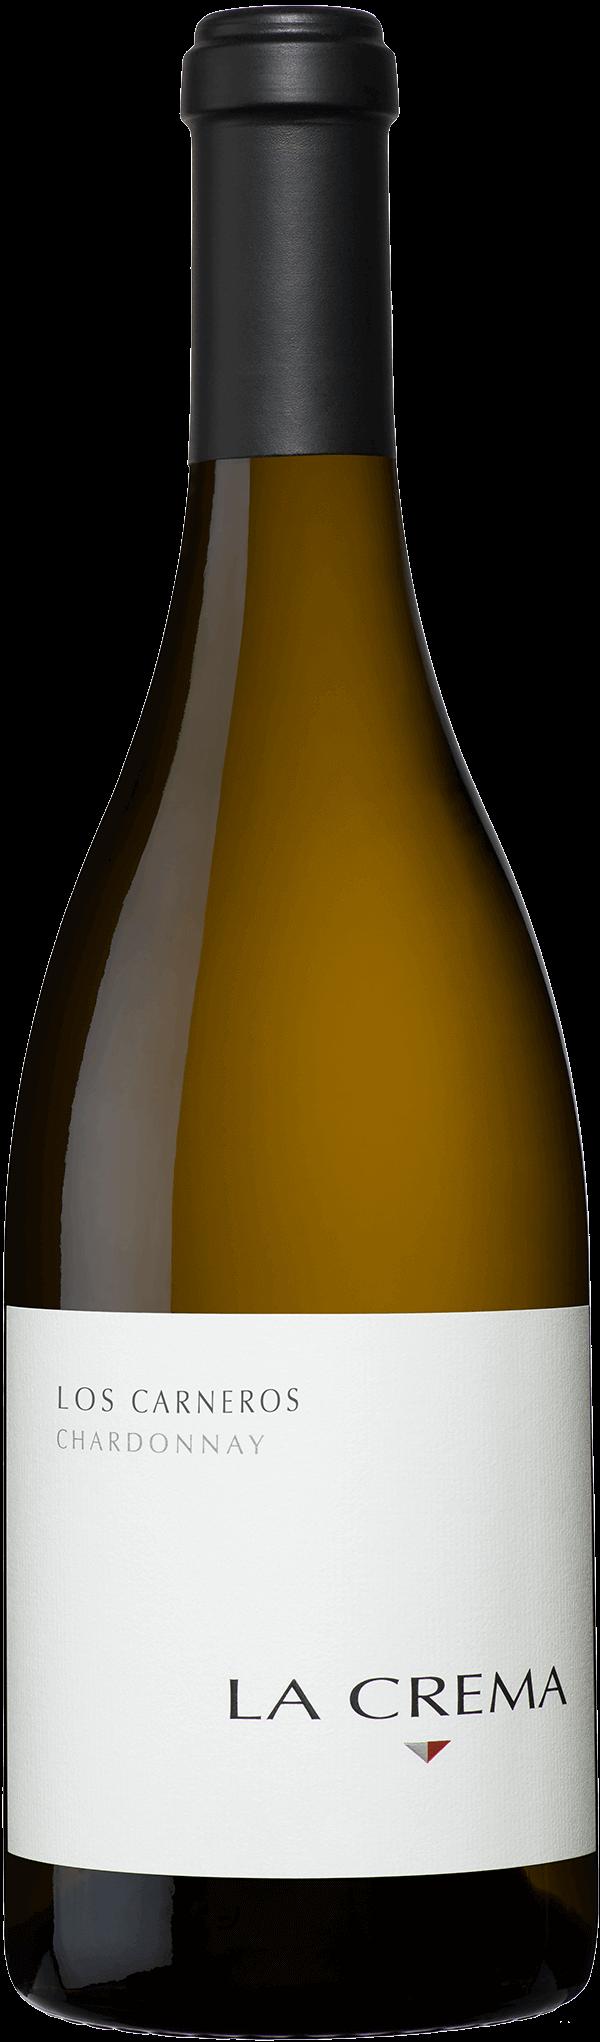 2019 Los Carneros Chardonnay